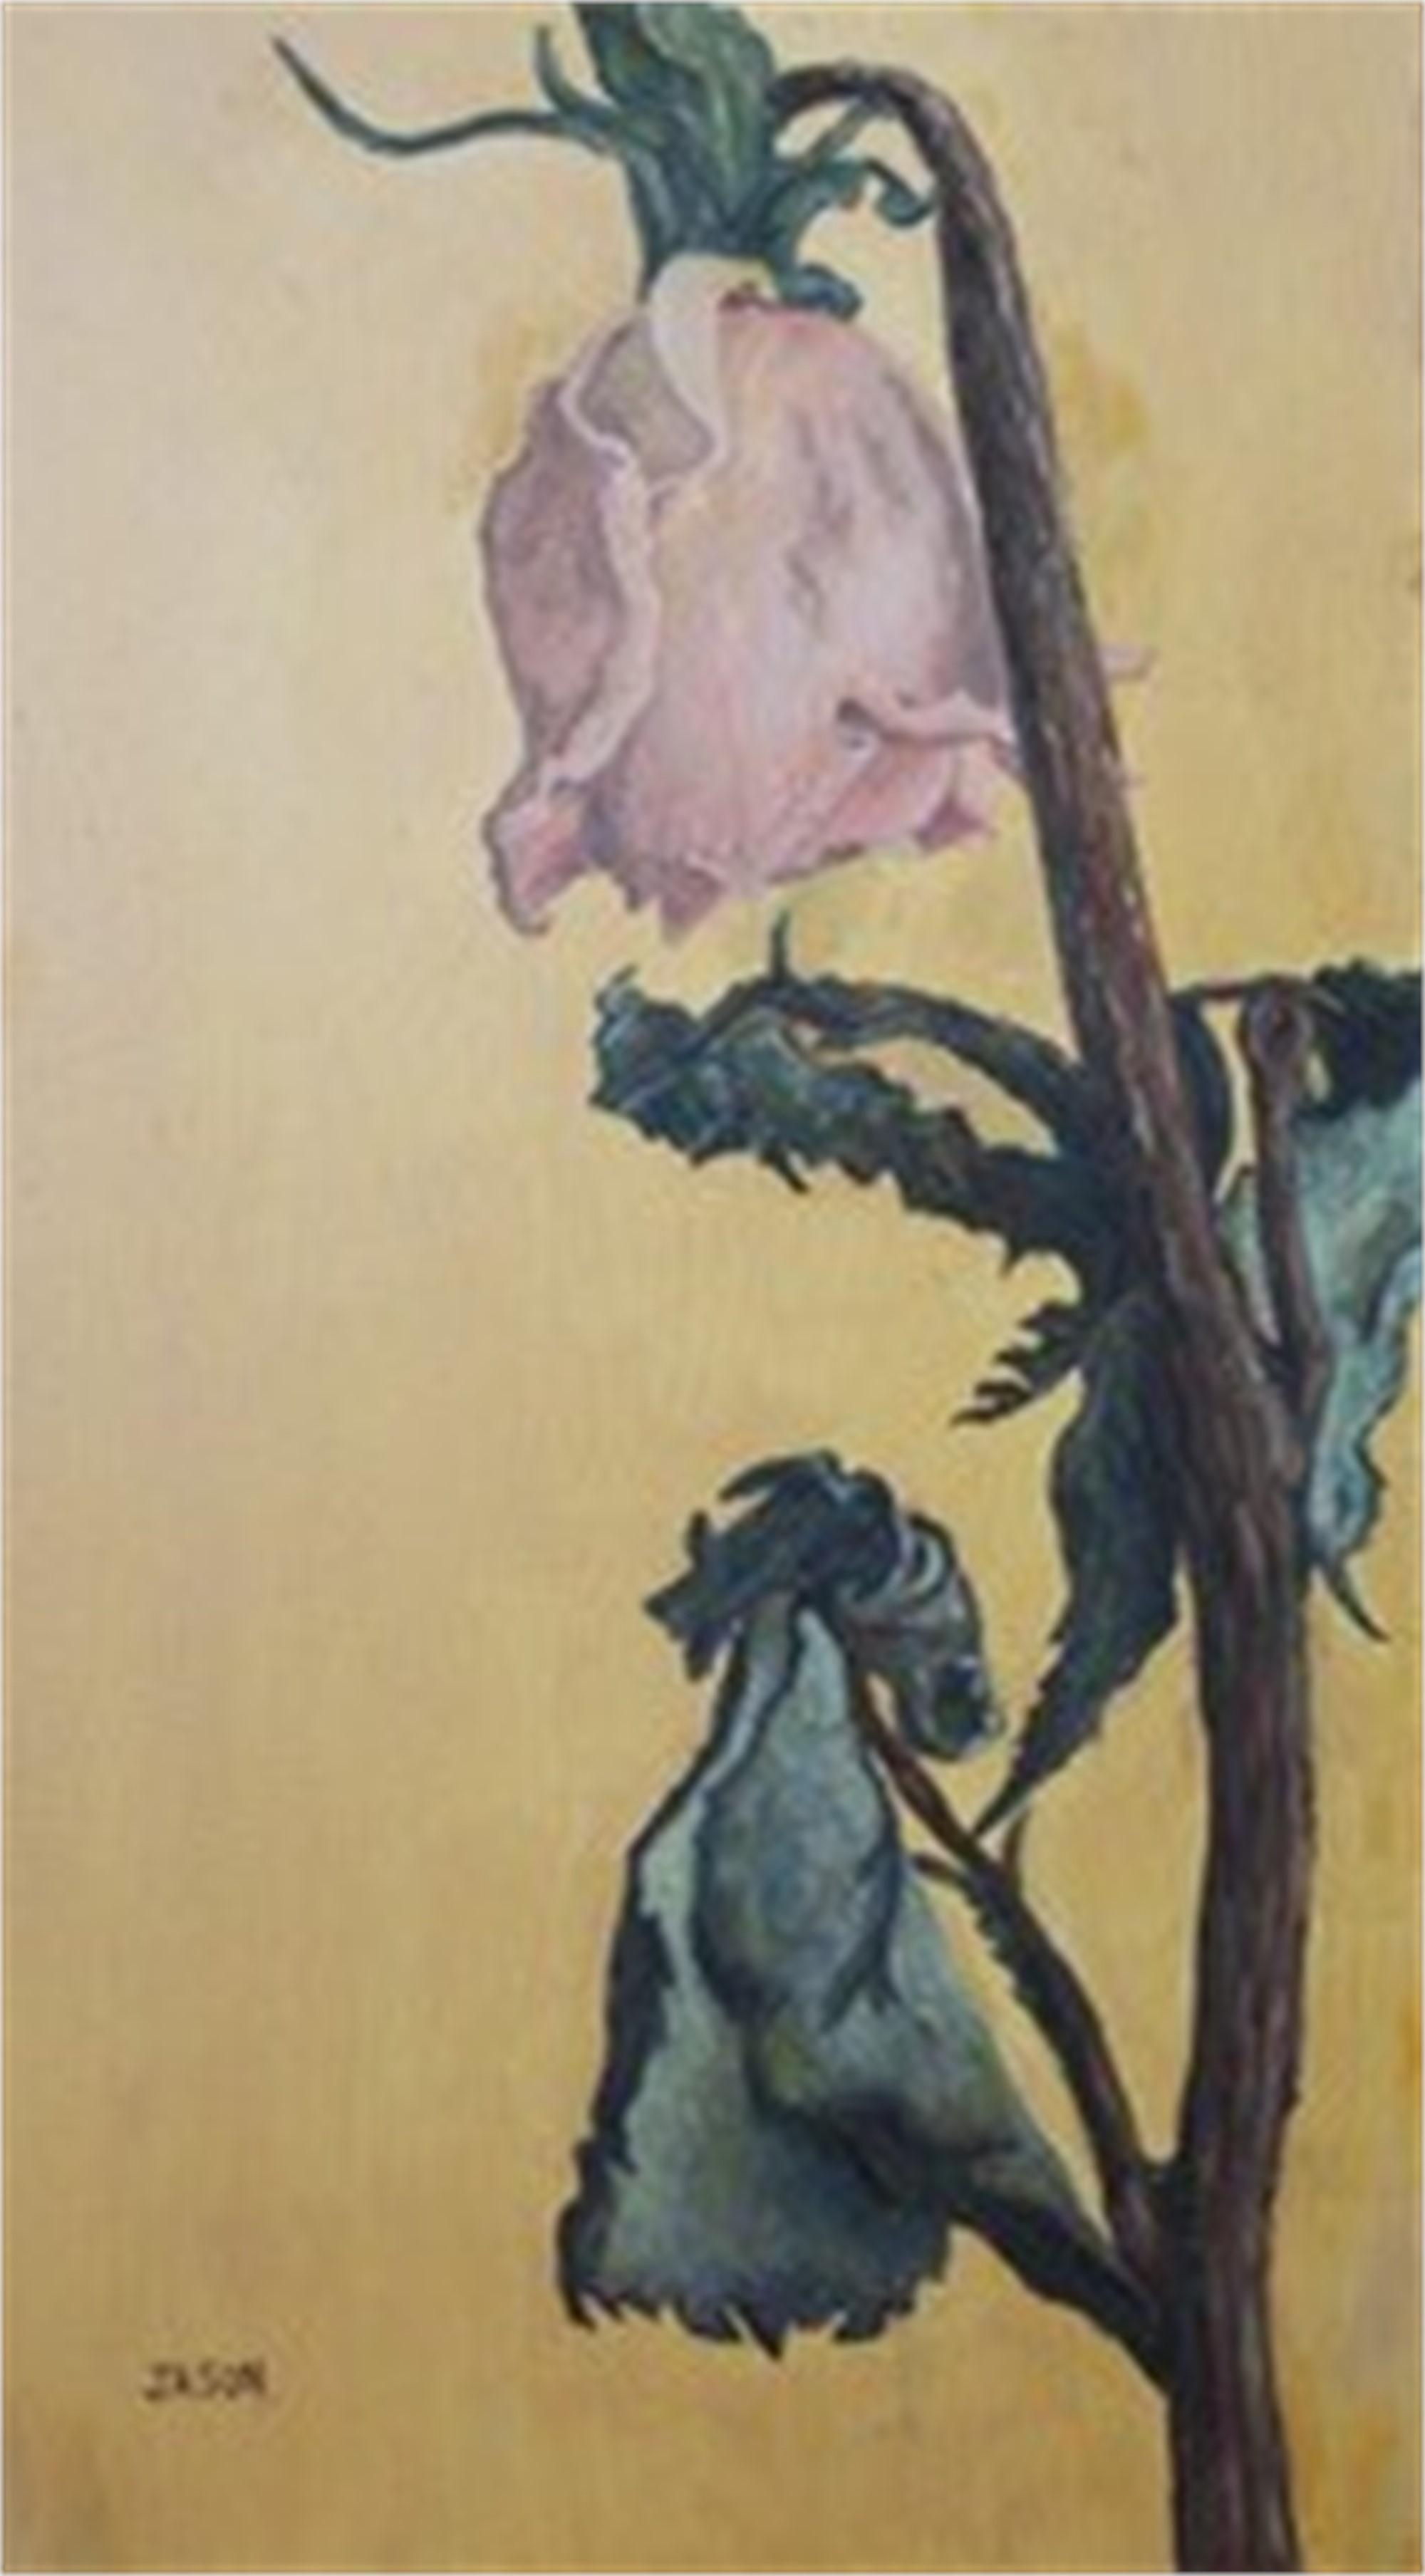 Autumn Rose #1 by Jason Berrier (Newberg, OR)